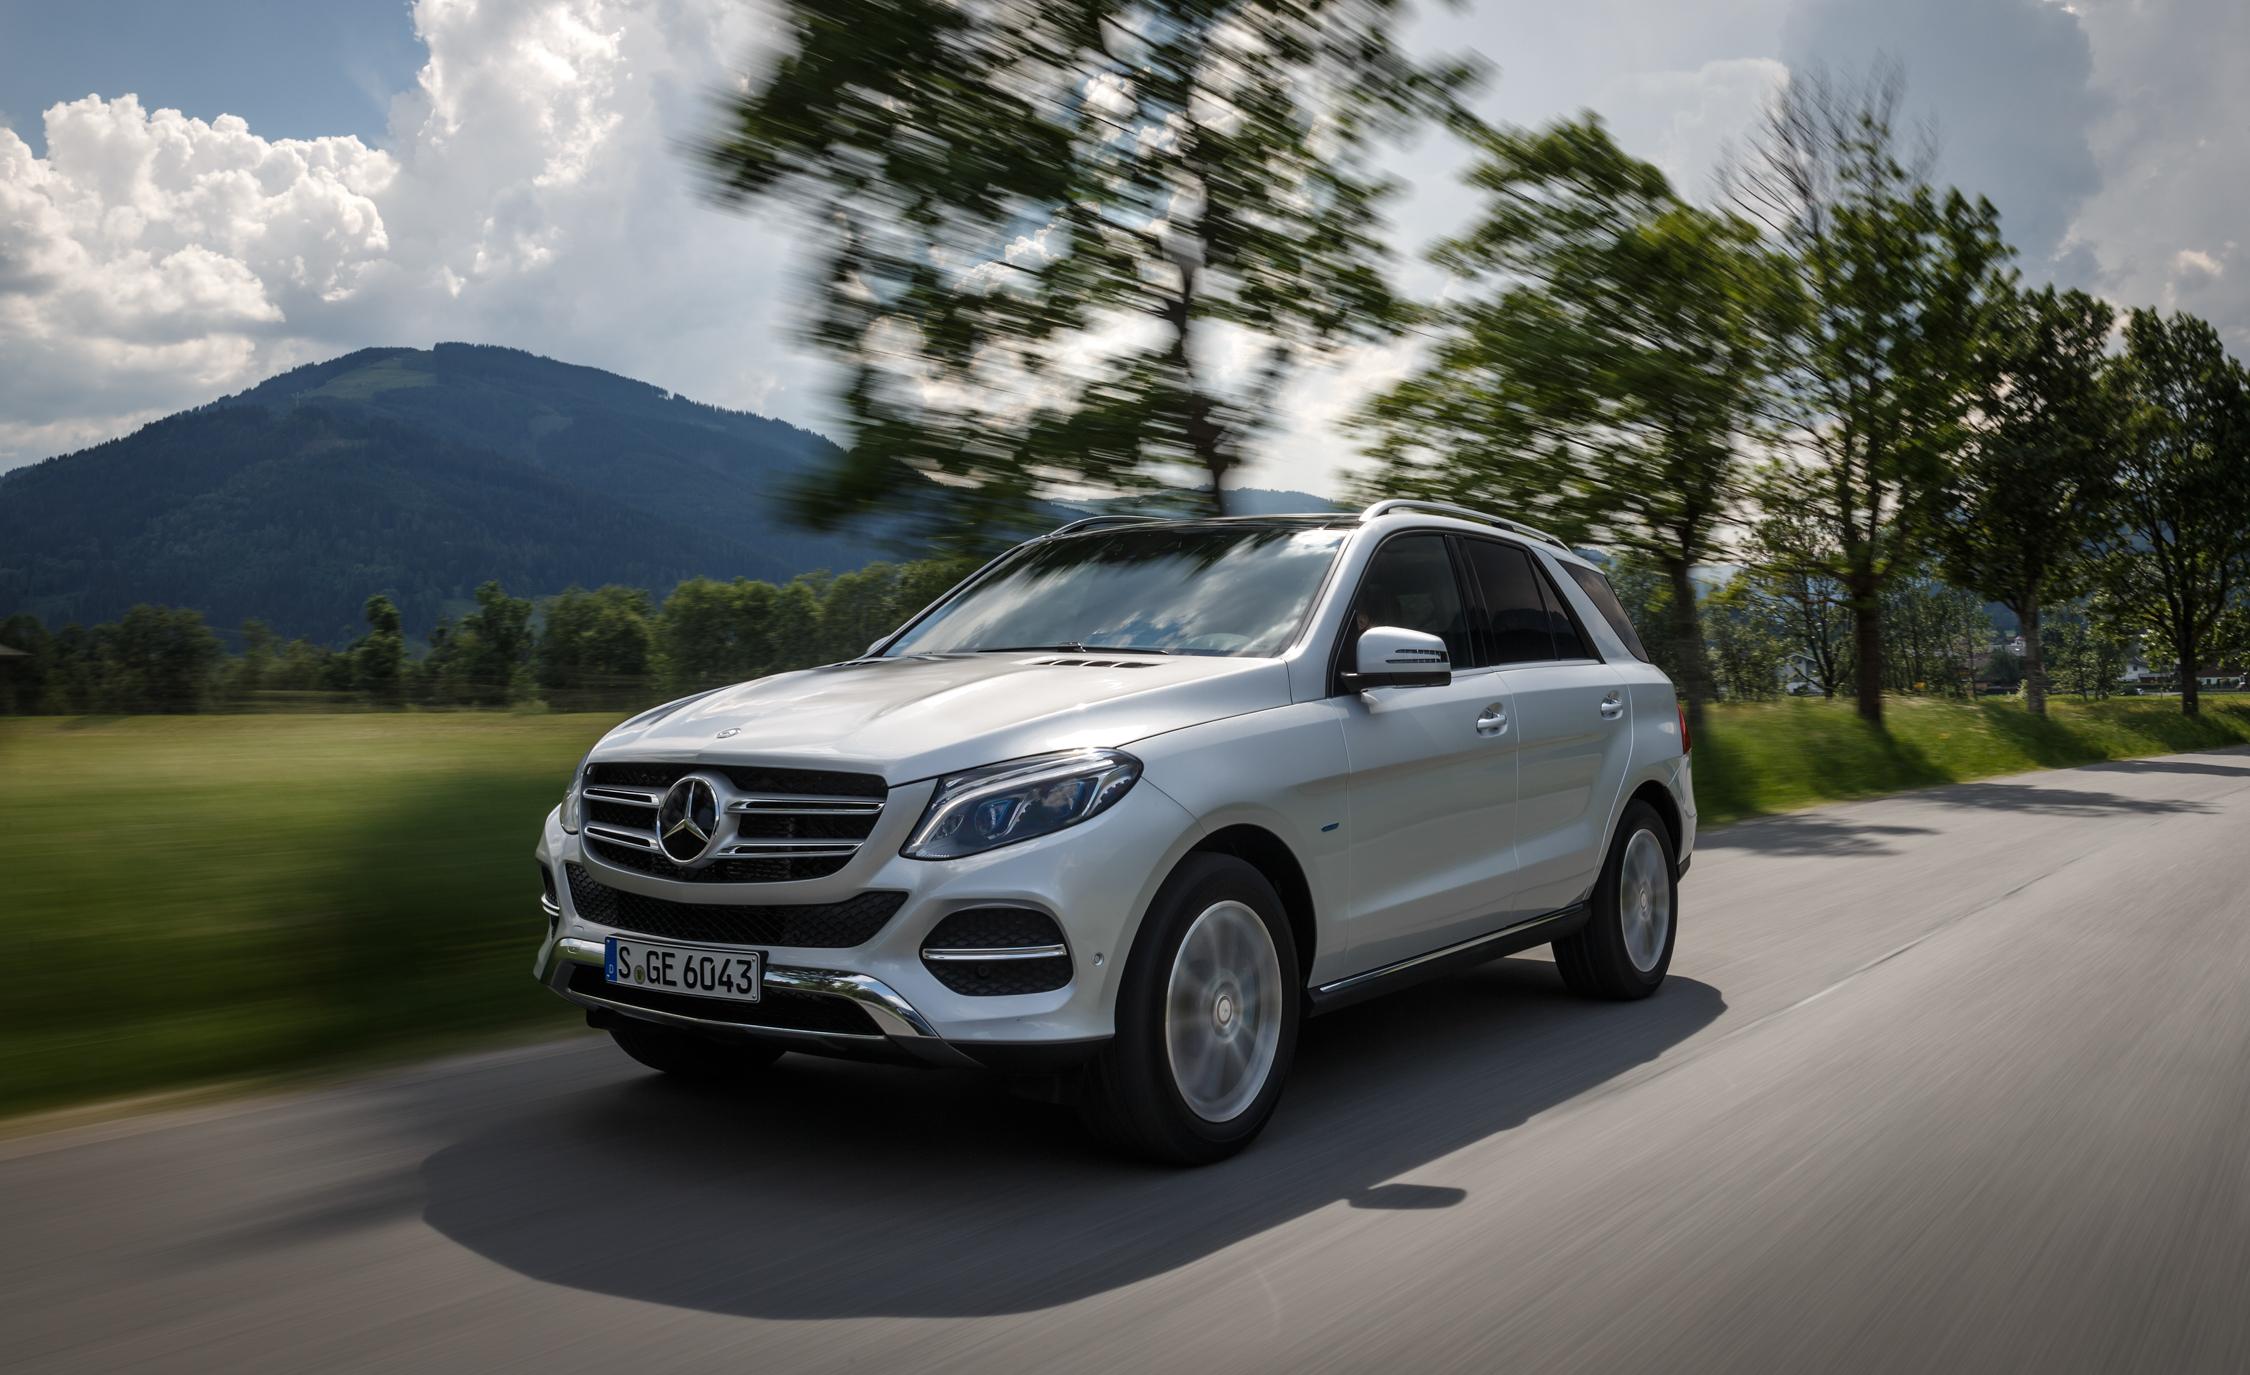 2016 Mercedes-Benz GLE500e 4MATIC Exterior Preview